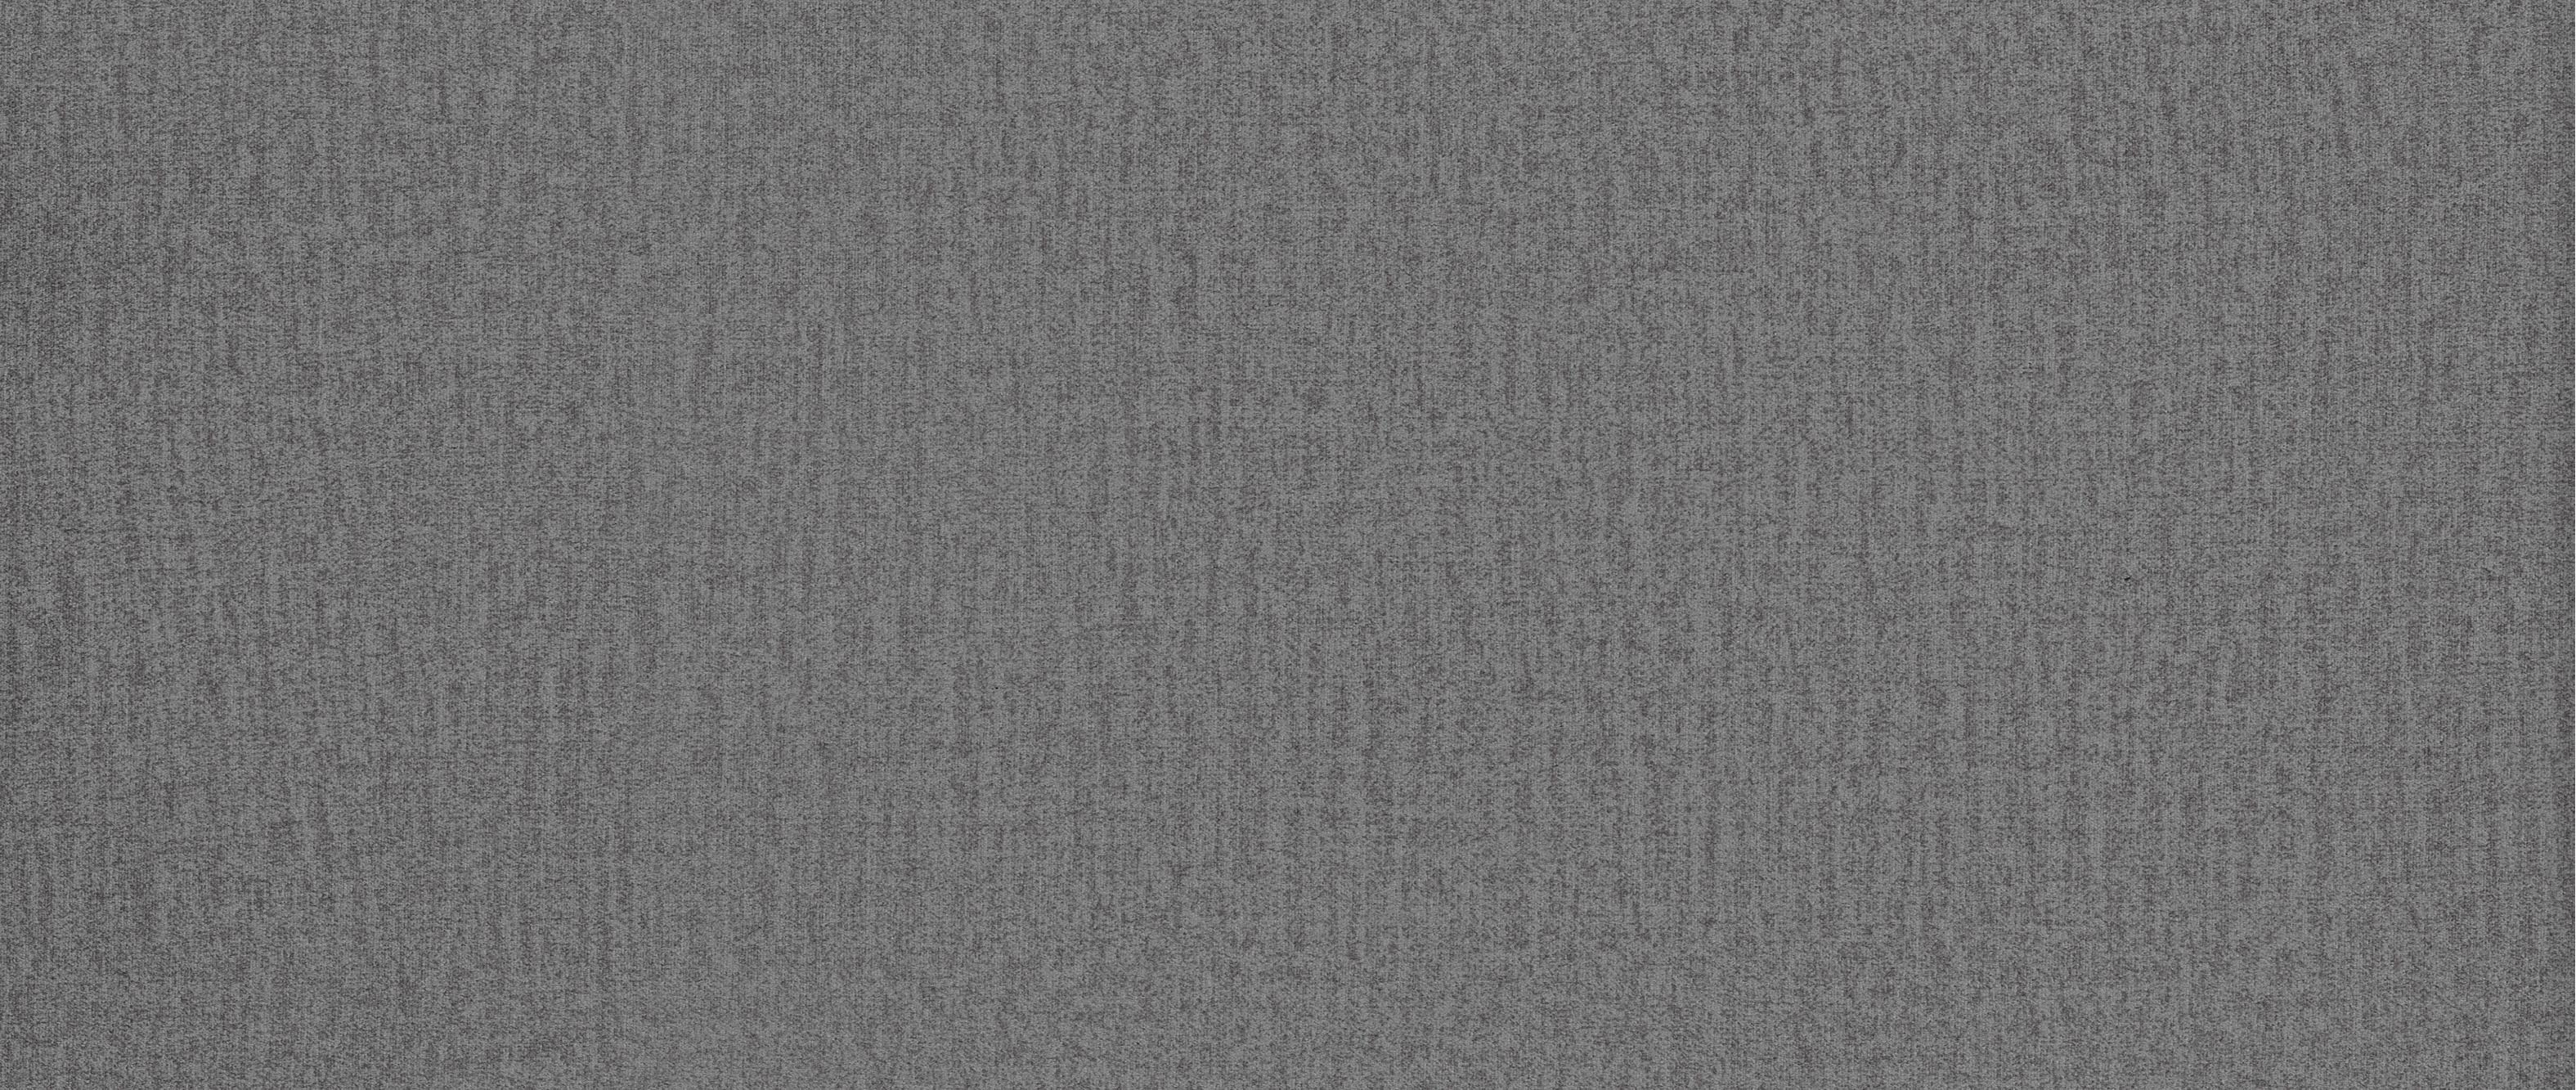 Monolith-85.jpg